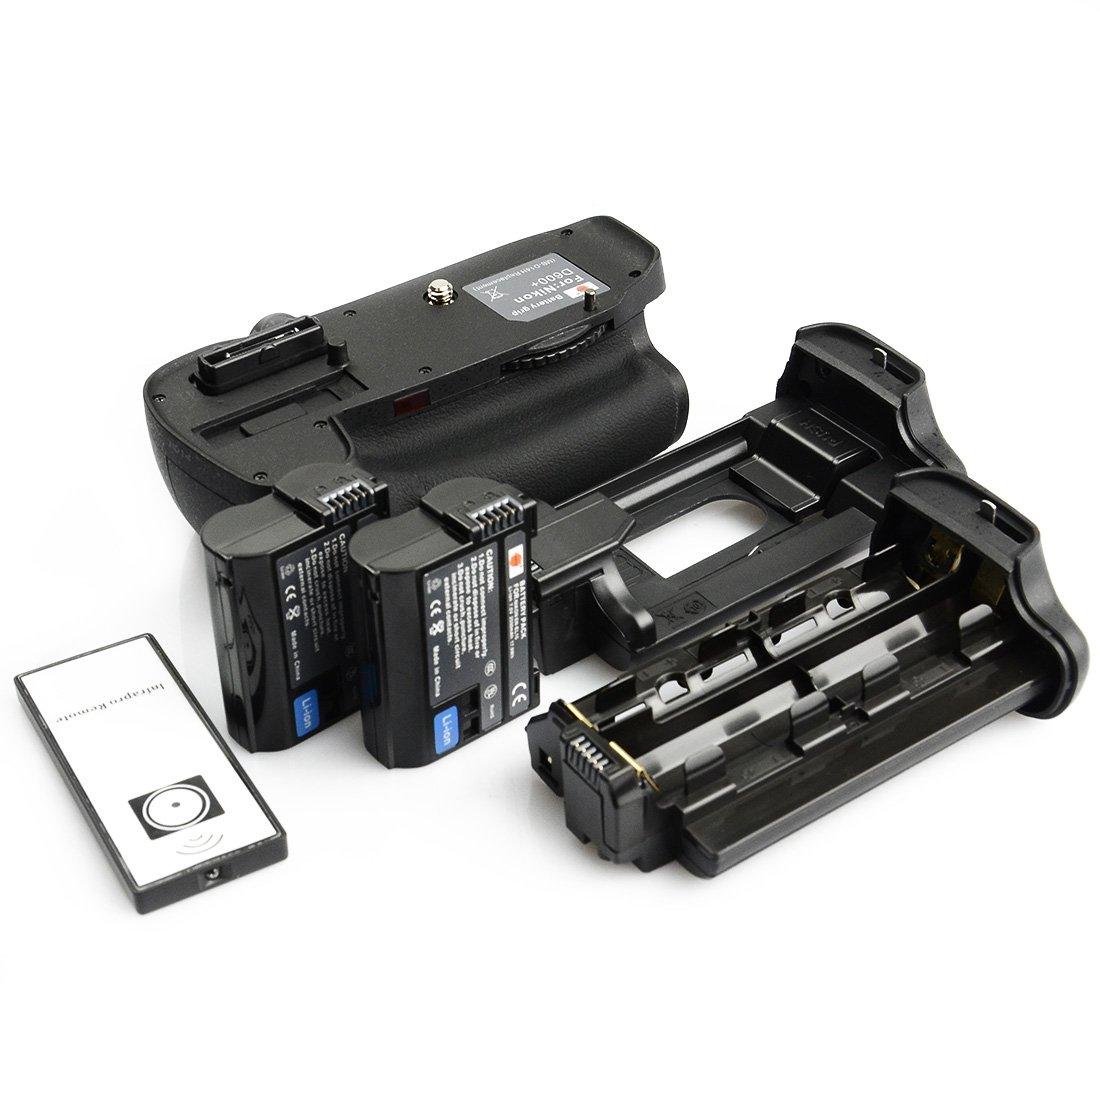 DSTE Pro IR Remote MB-D14 Vertical Battery Grip + 2x EN-EL15 for Nikon D610 D600 SLR Digital Camera